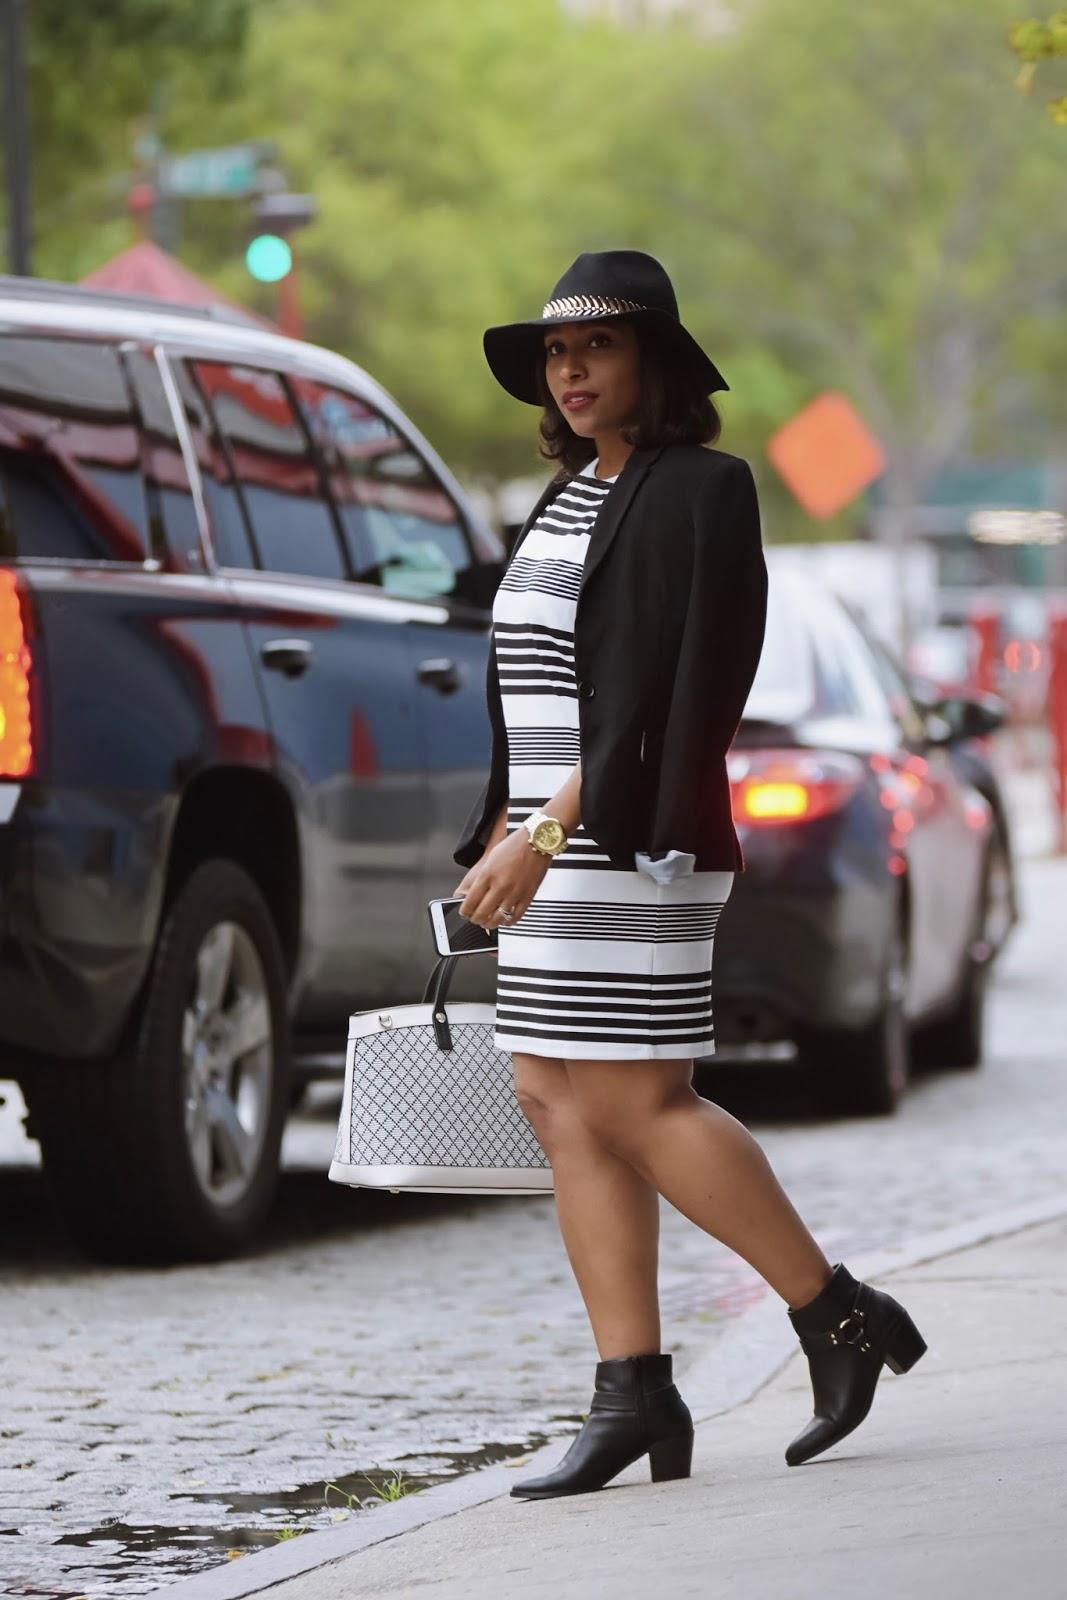 Pamella Roland, New york fashion week 2017, nyfw, nyfw streetstyle, new york city, fashion week, nyfw septmeber, ss17, shoptobi, brooklynhat company, pier 59